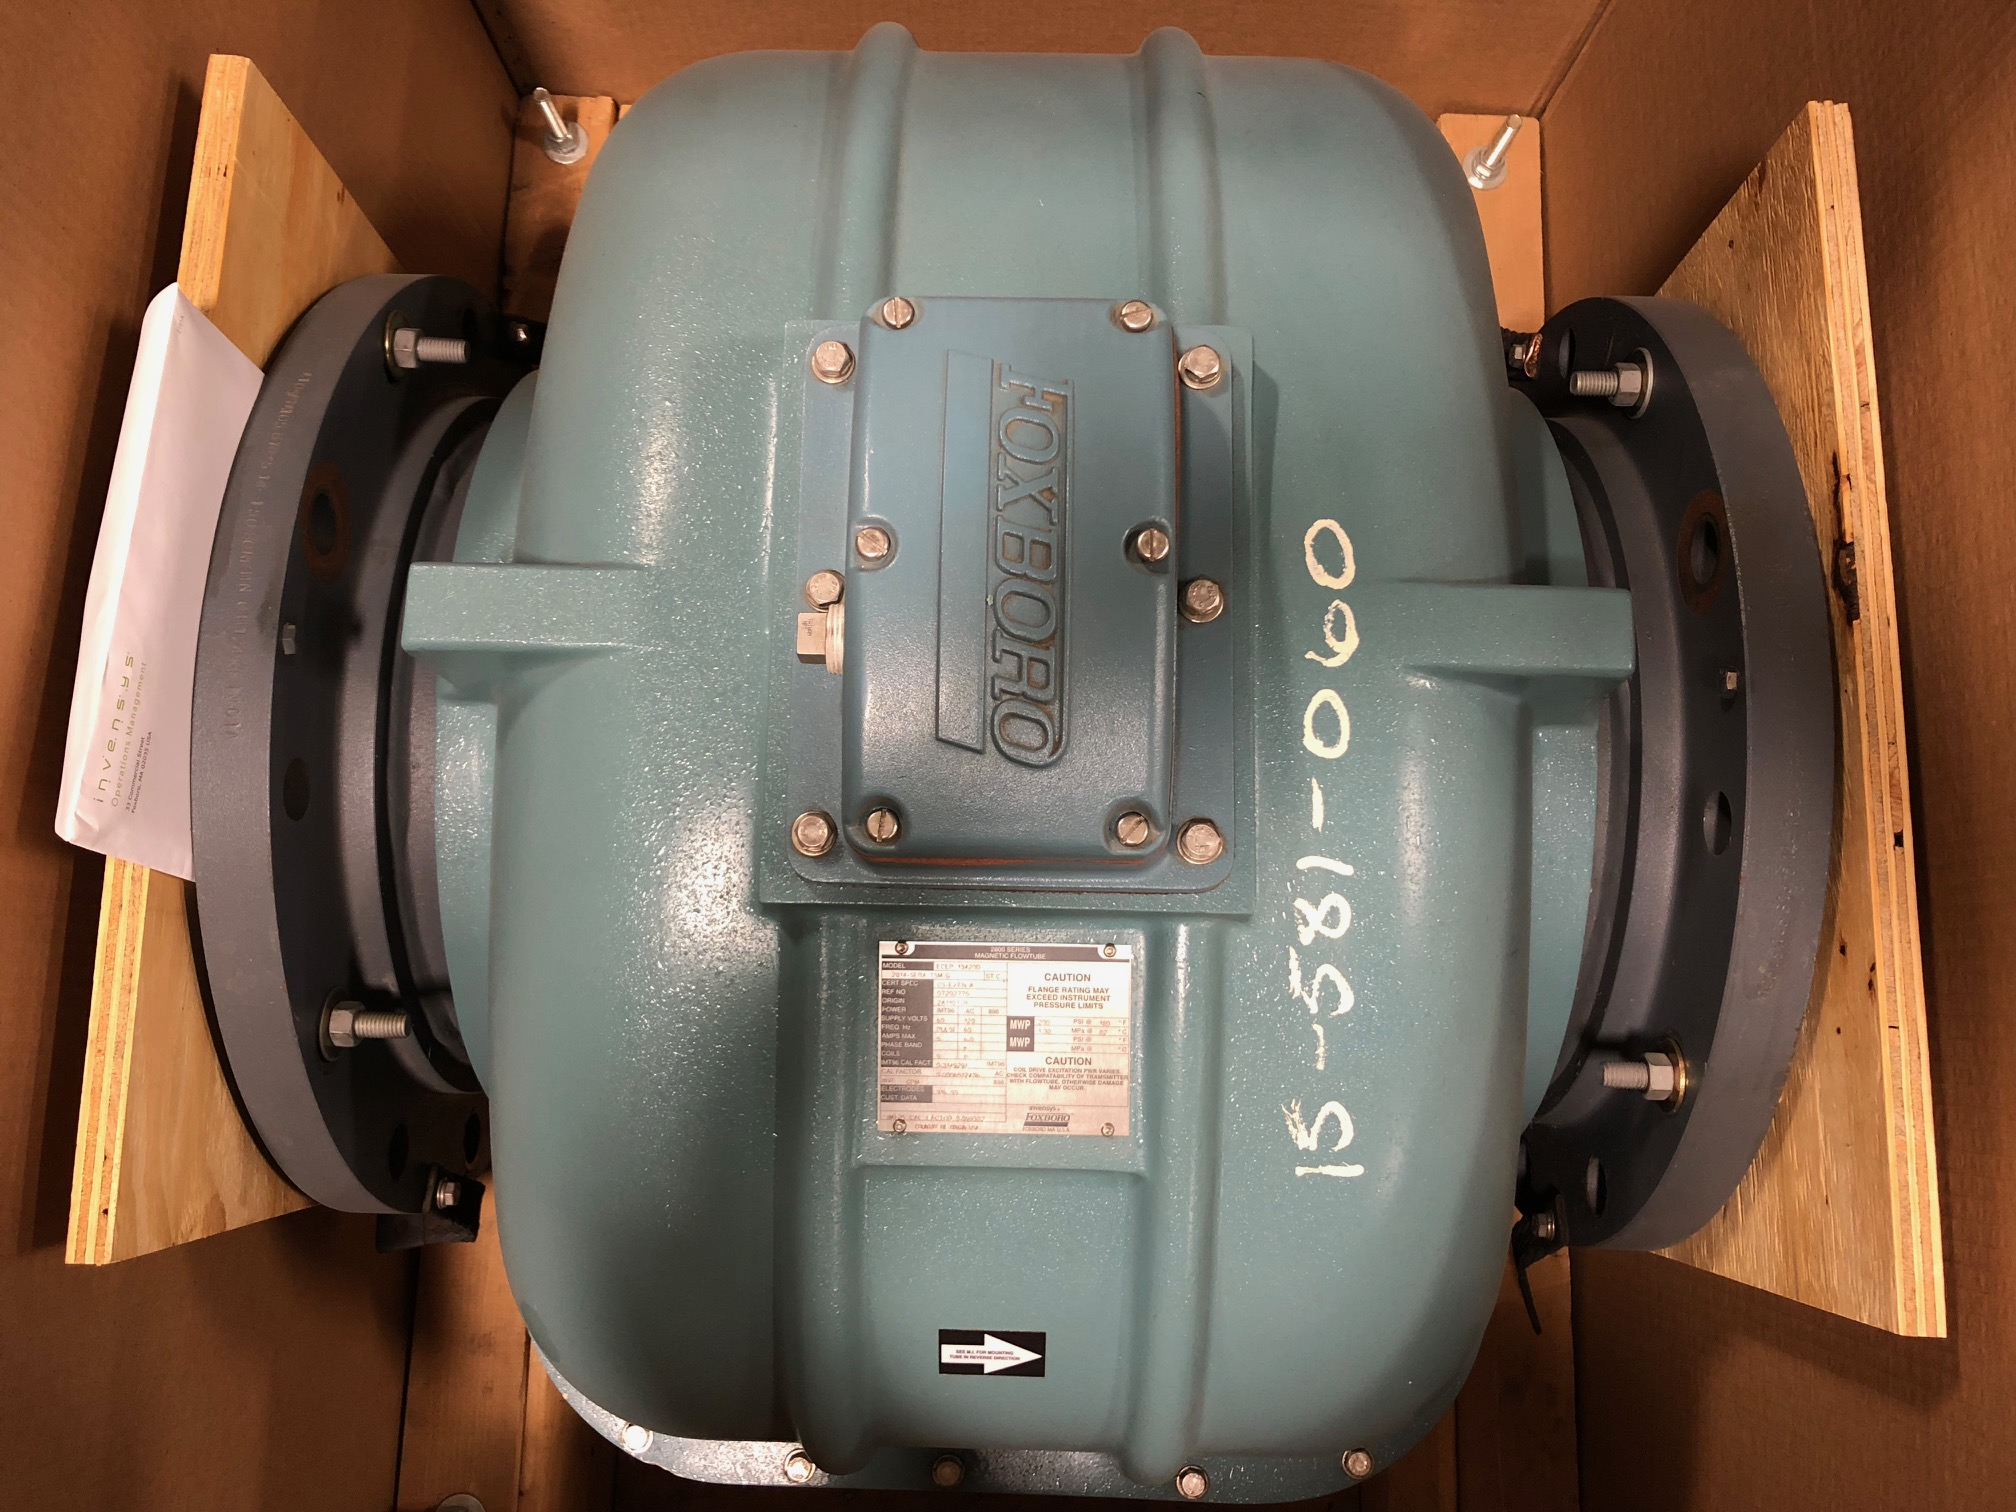 Foxboro 2814-SEBA-TSM-G 14in. CL150 Magnetic Flowmeter